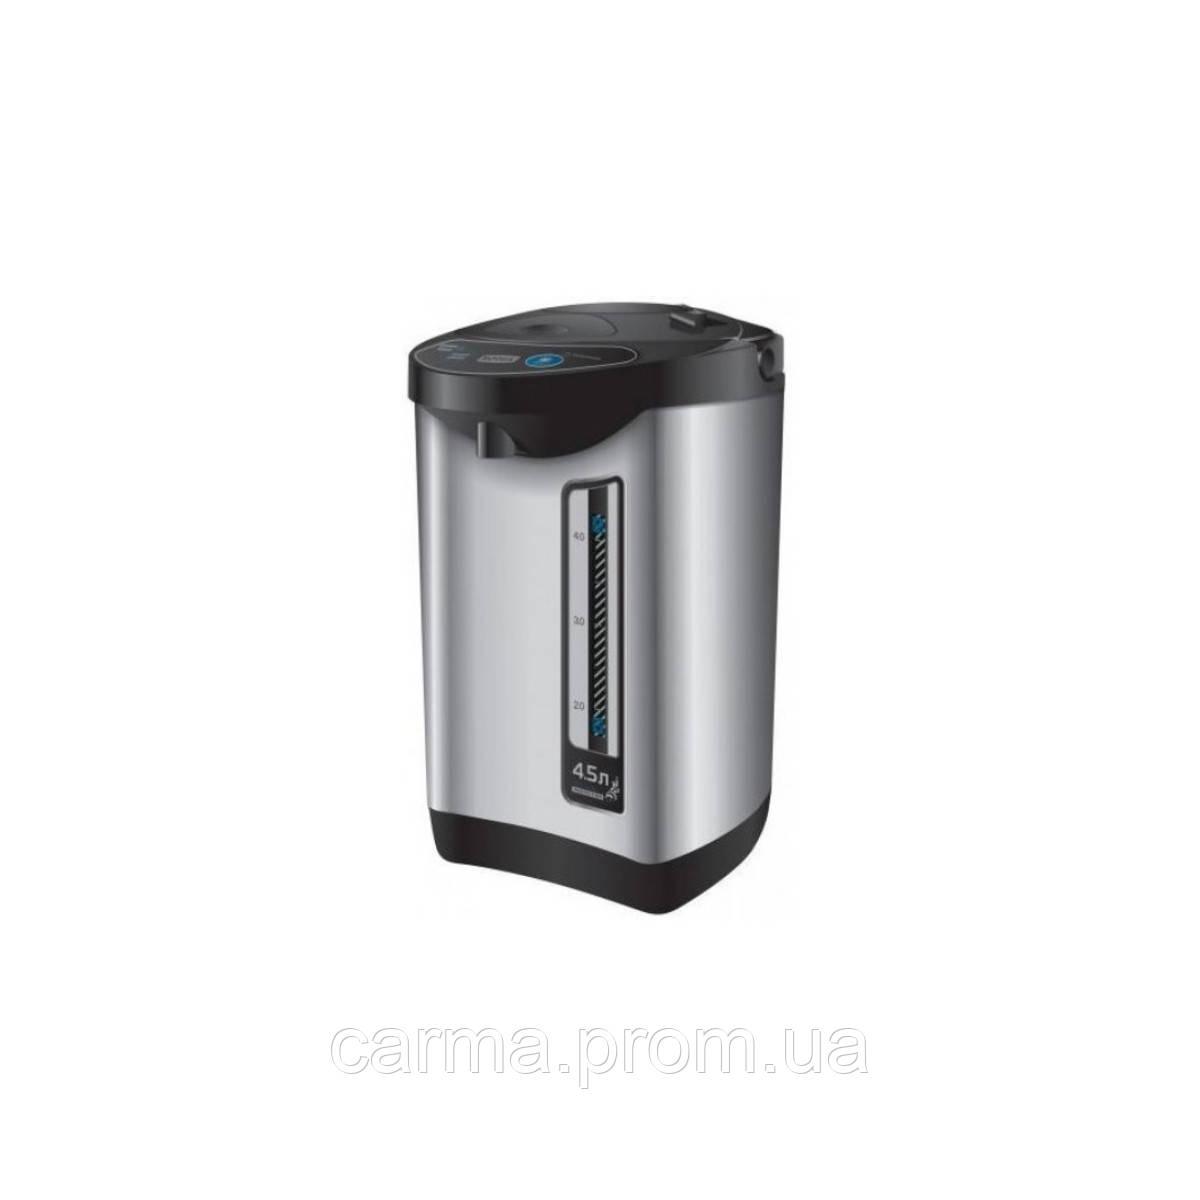 Термопот Rotex RTP 450-U 4.5 л Серебристый/Черный